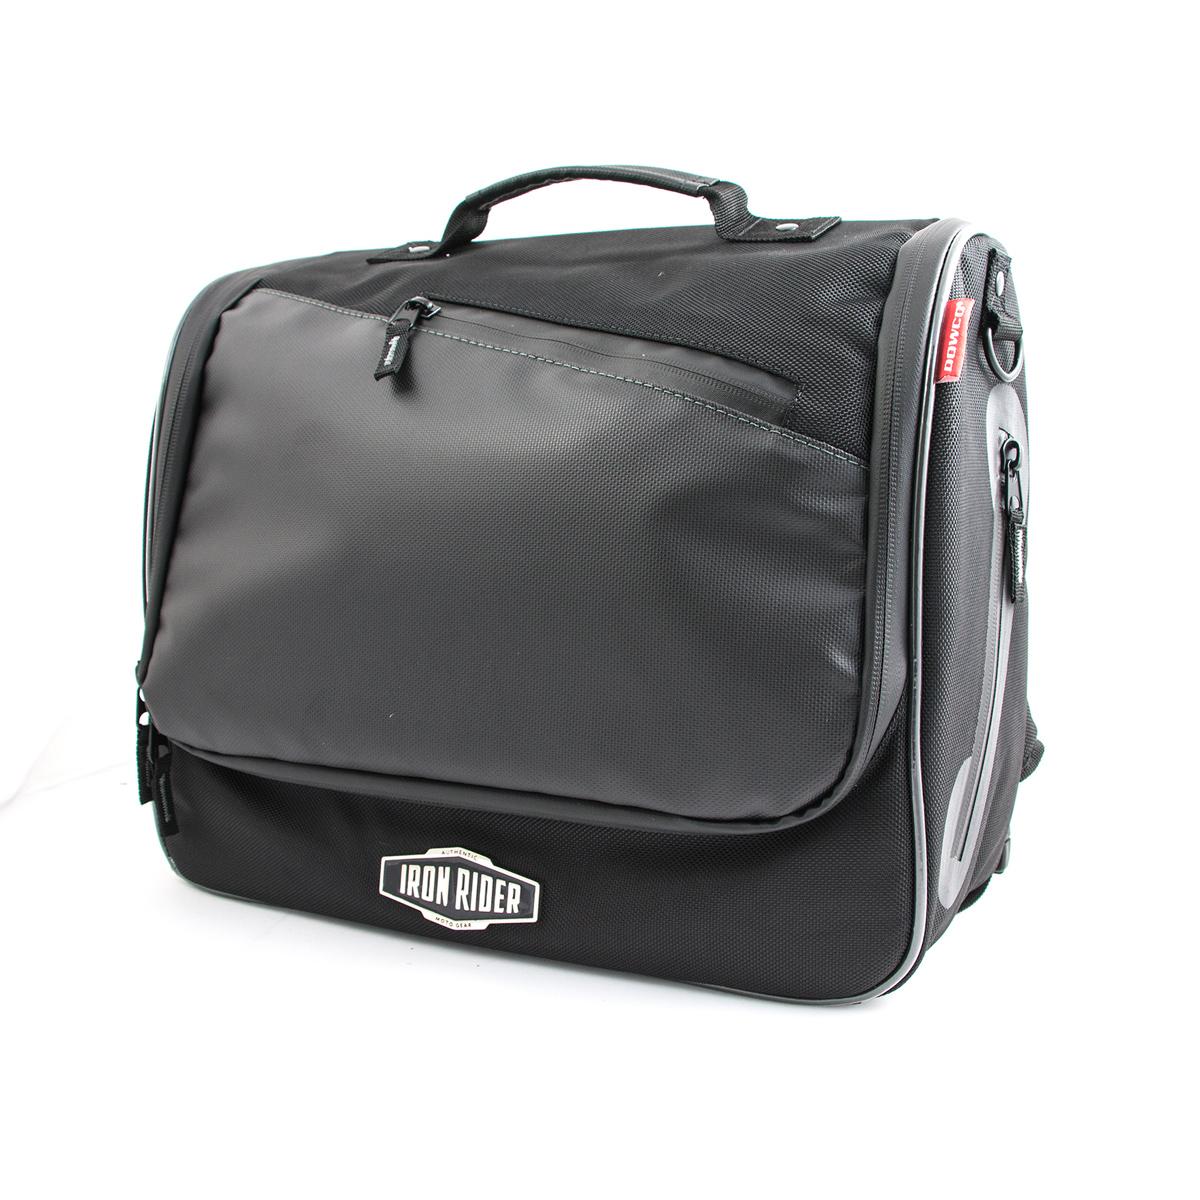 Iron Rider Messenger Bag